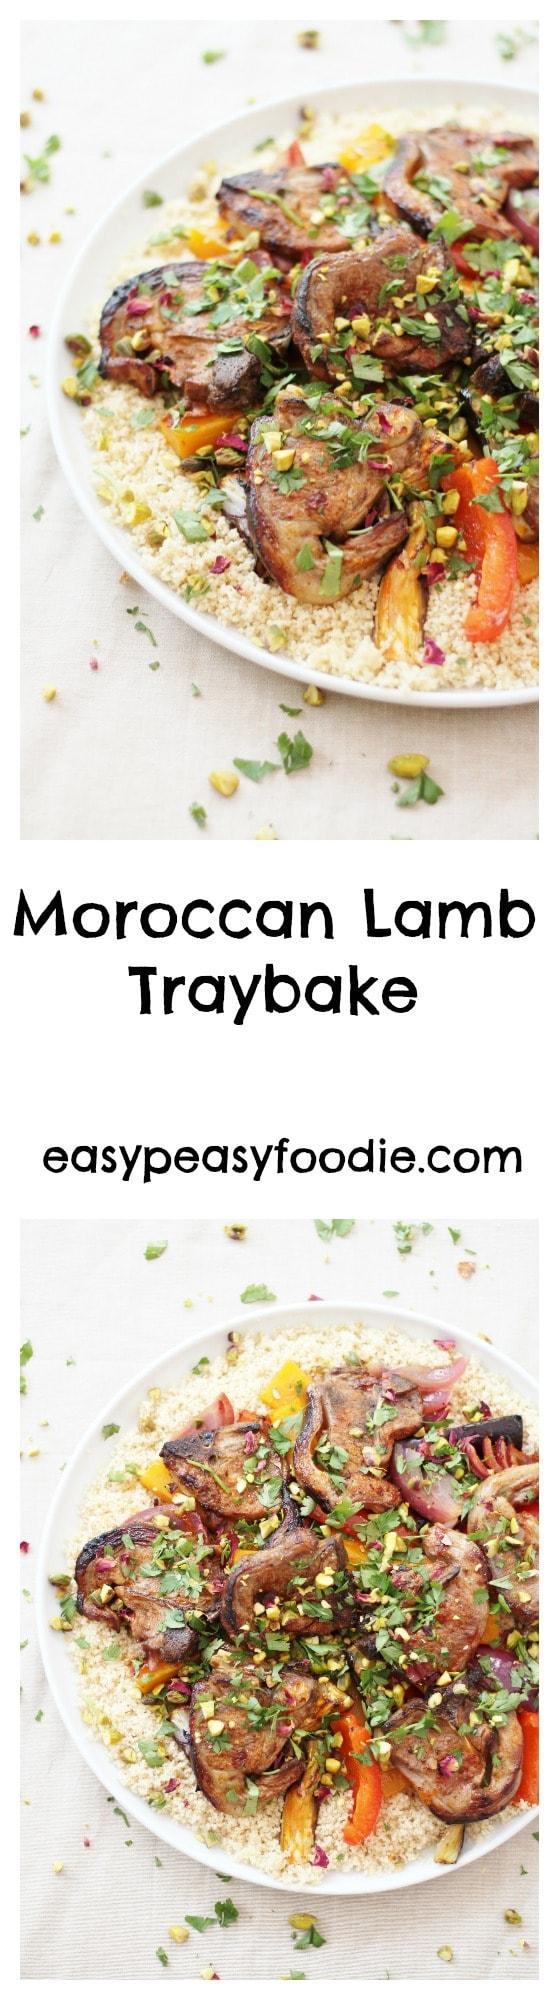 Moroccan Lamb Traybake - pinnable image for Pinterest